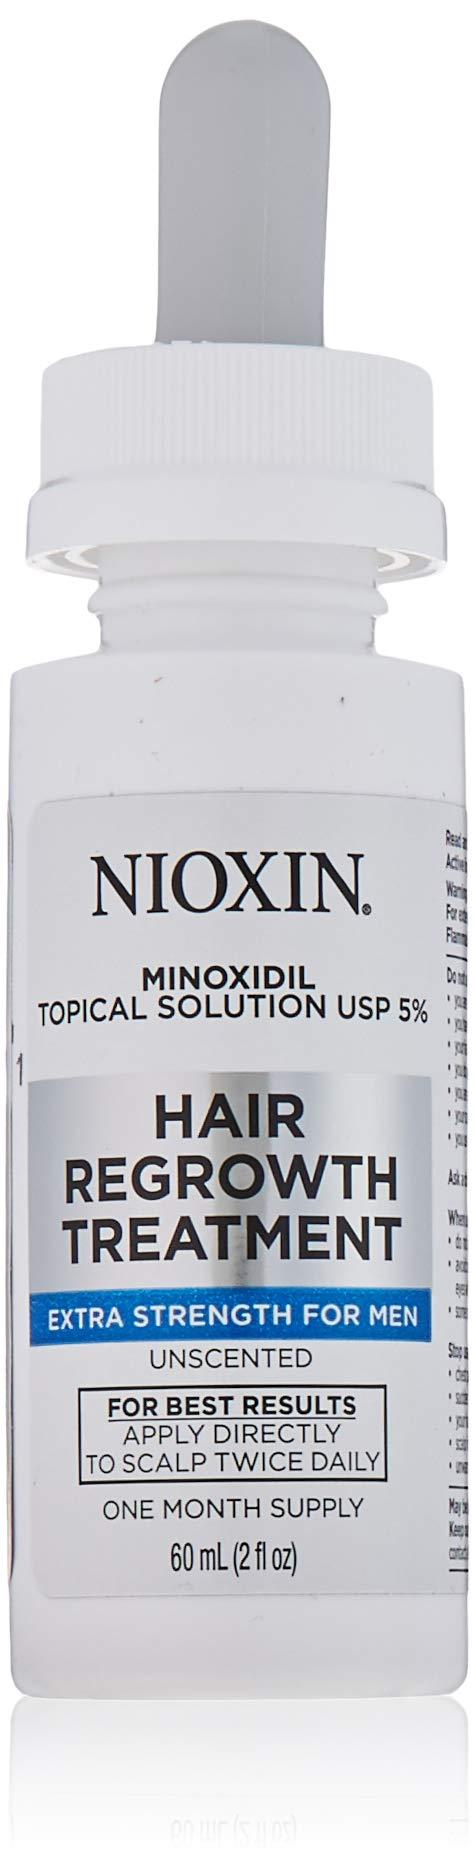 Nioxin Minoxidil Hair Regrowth Treatment Men, 2 oz. by Nioxin